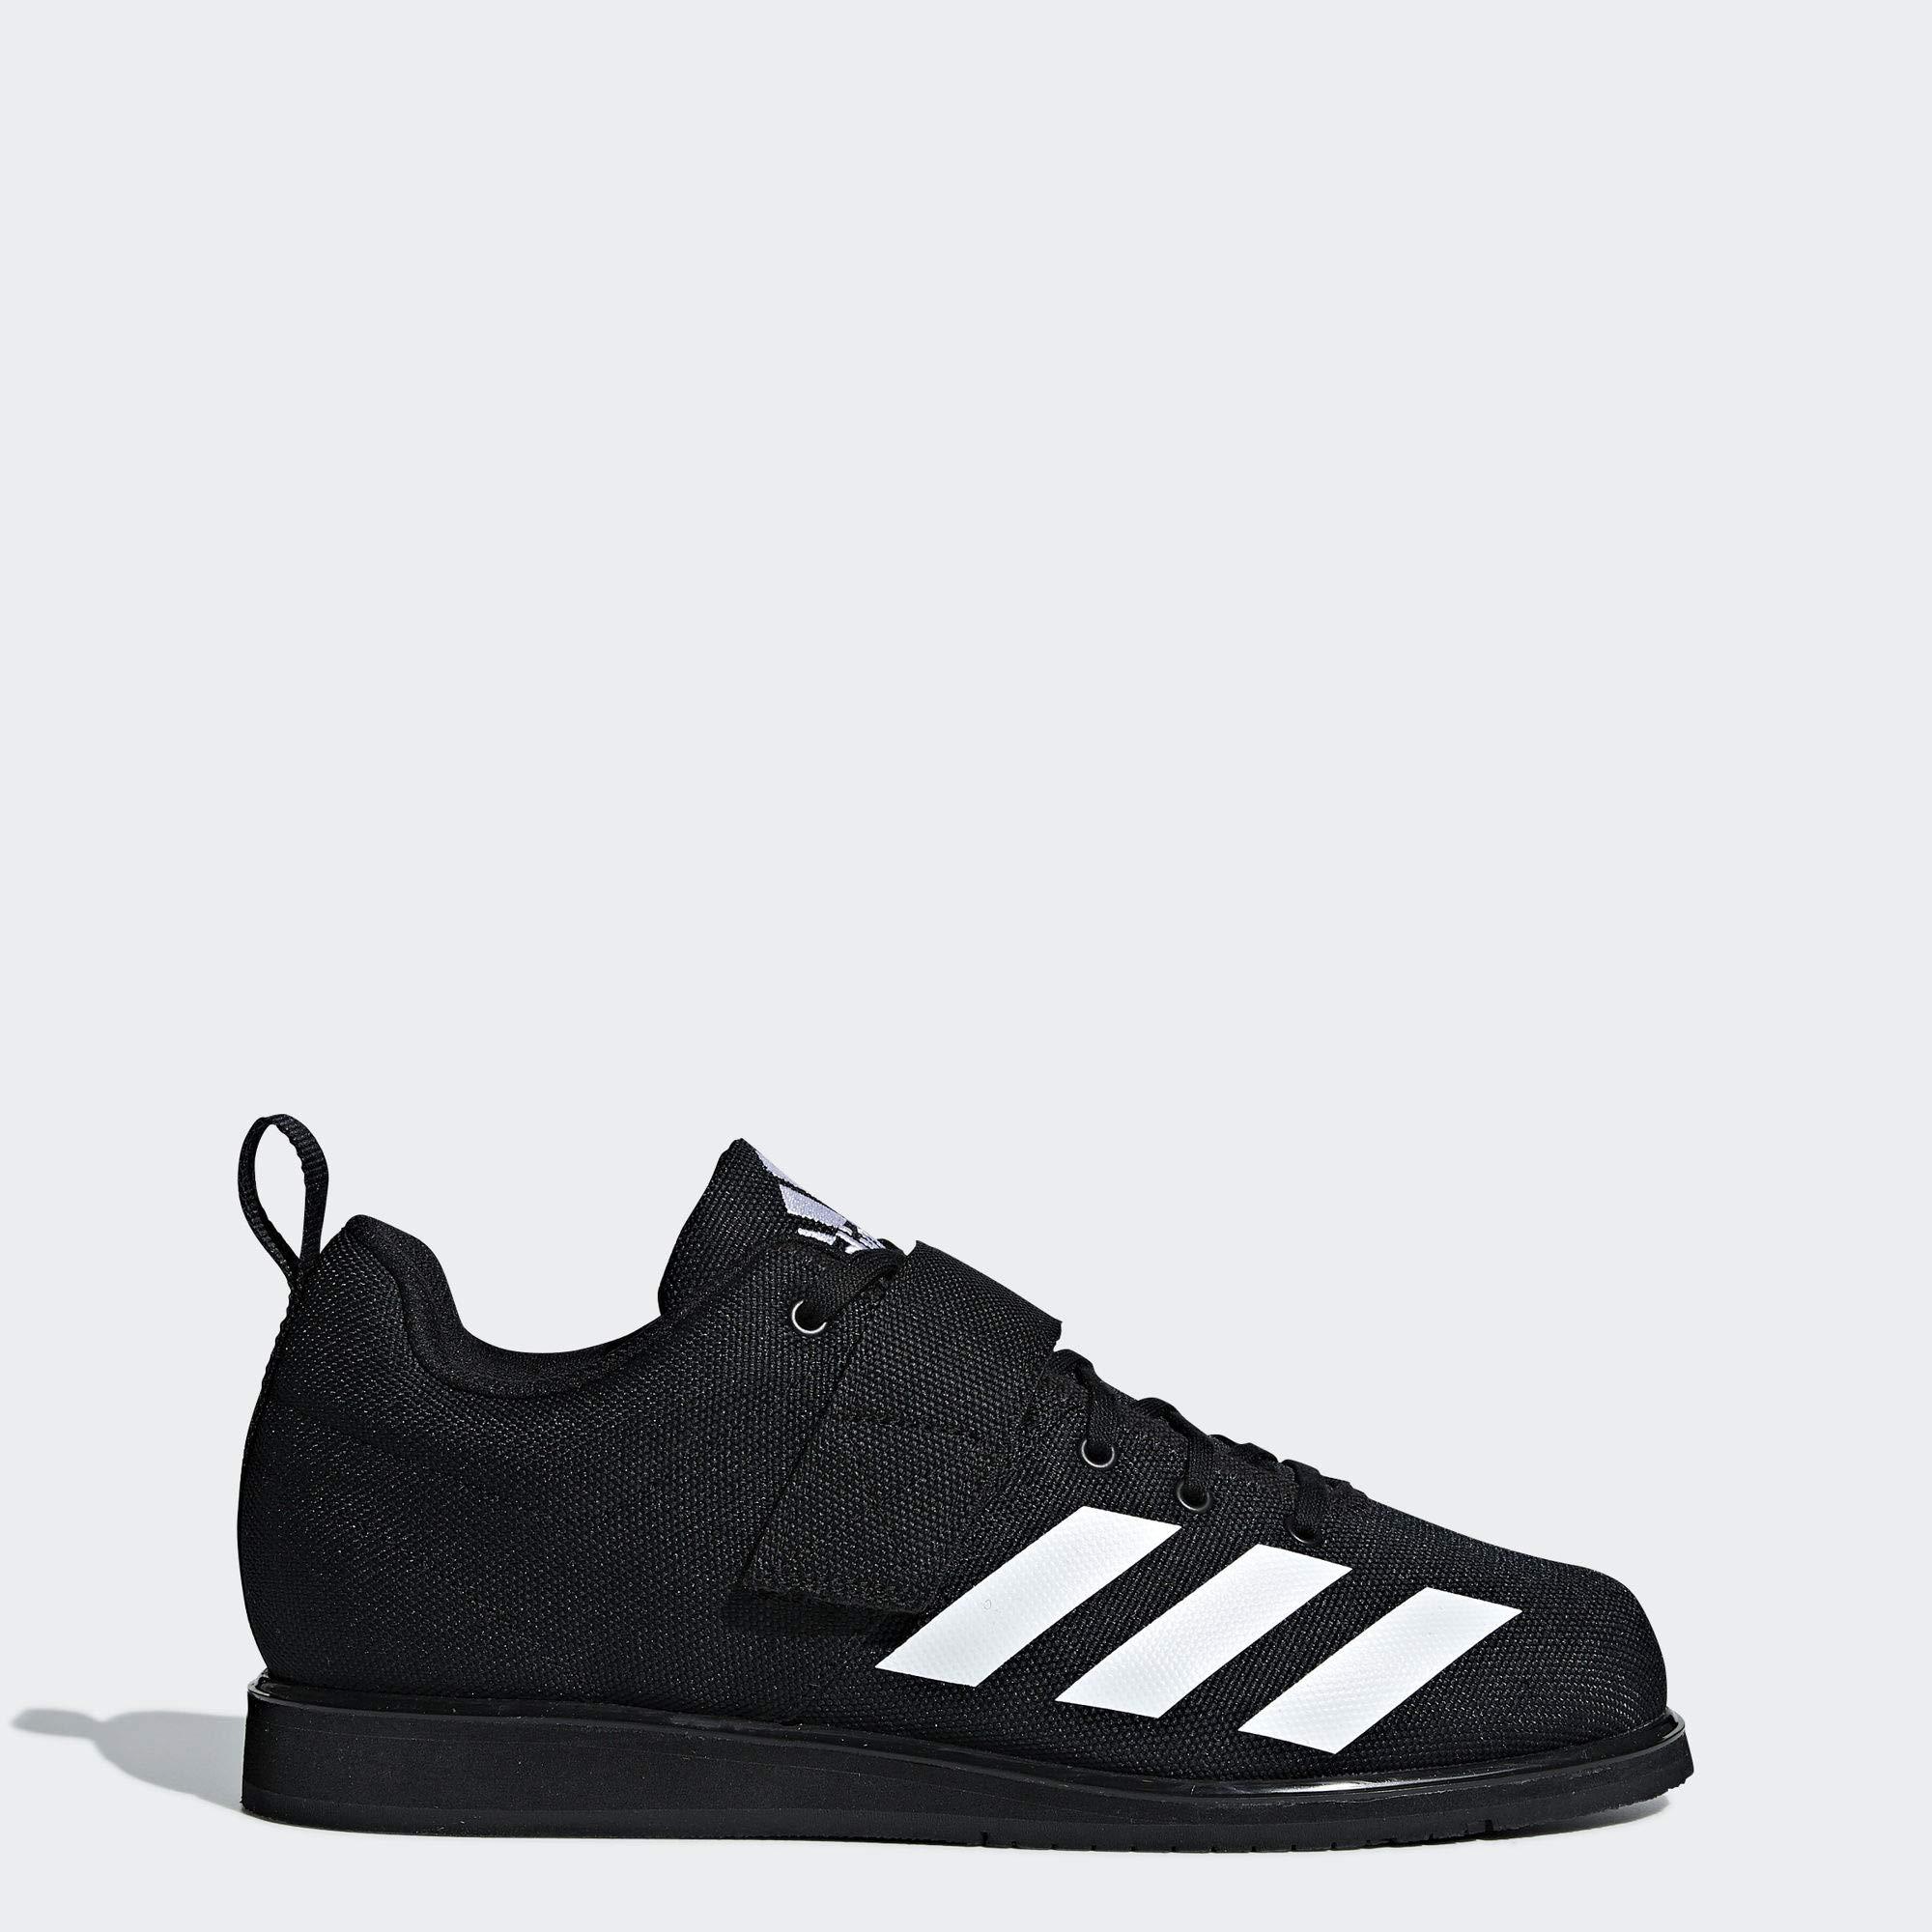 adidas Men's Powerlift 4 Weightlifting Shoe, White/Black, 10.5 M US by adidas